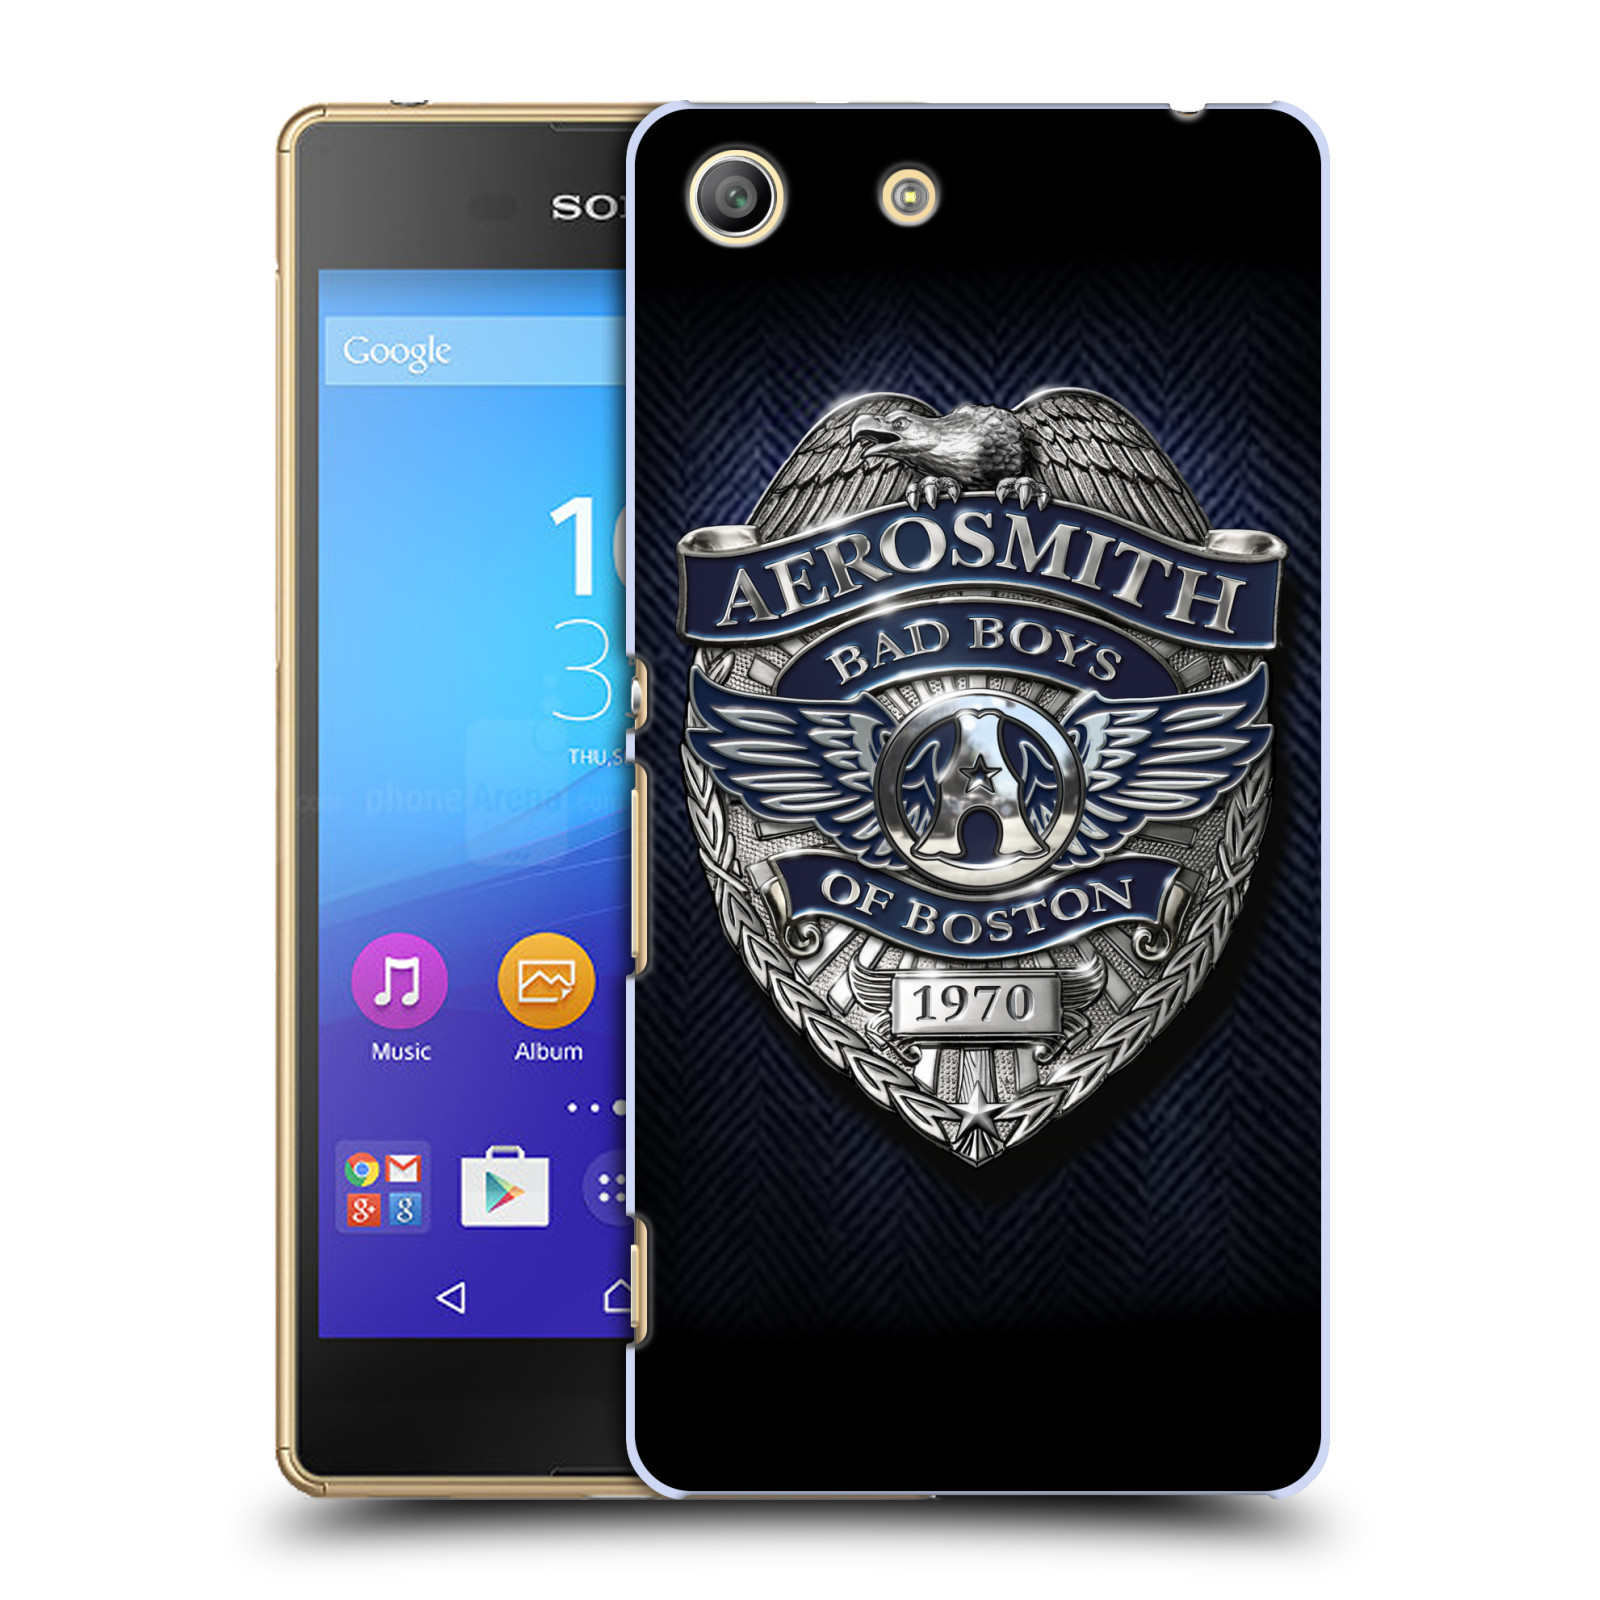 Plastové pouzdro na mobil Sony Xperia M5 HEAD CASE - Aerosmith - Bad Boys of Boston